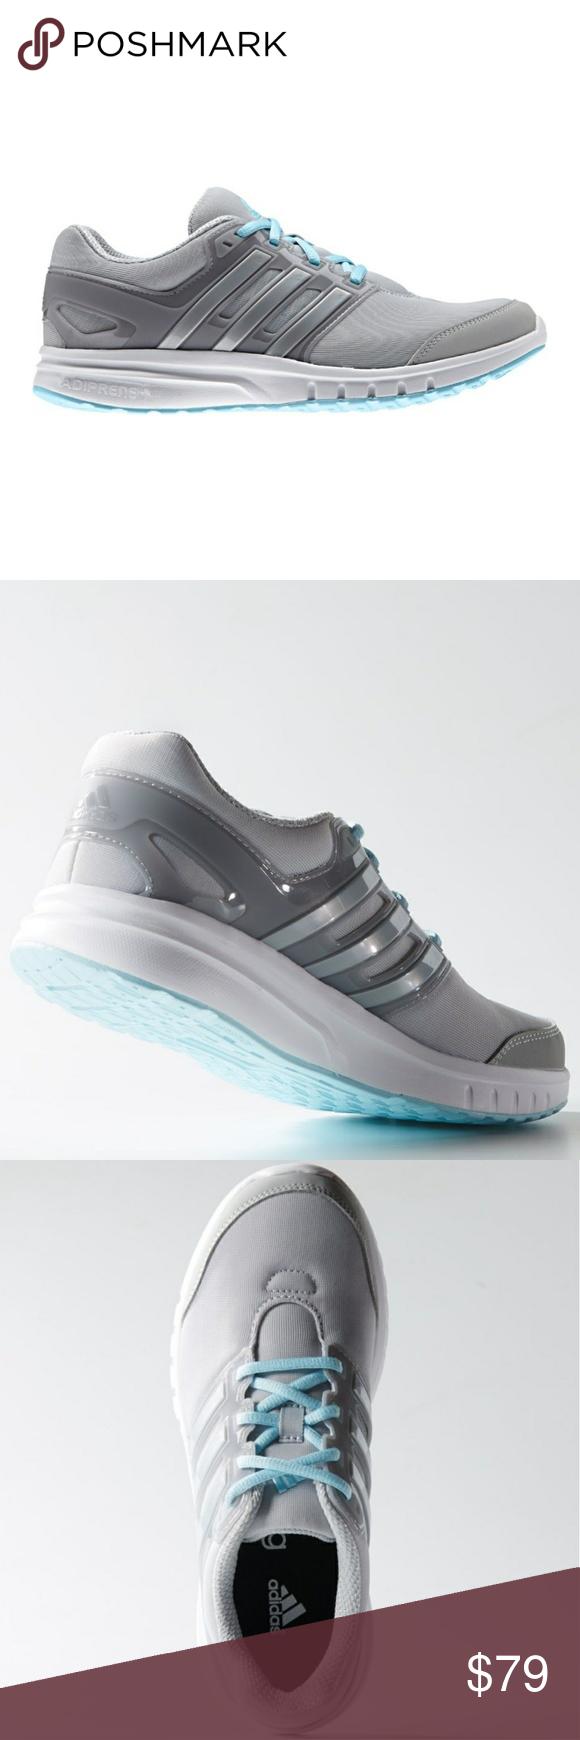 ⭐SALE⭐ adidas Running Shoes AdiWear